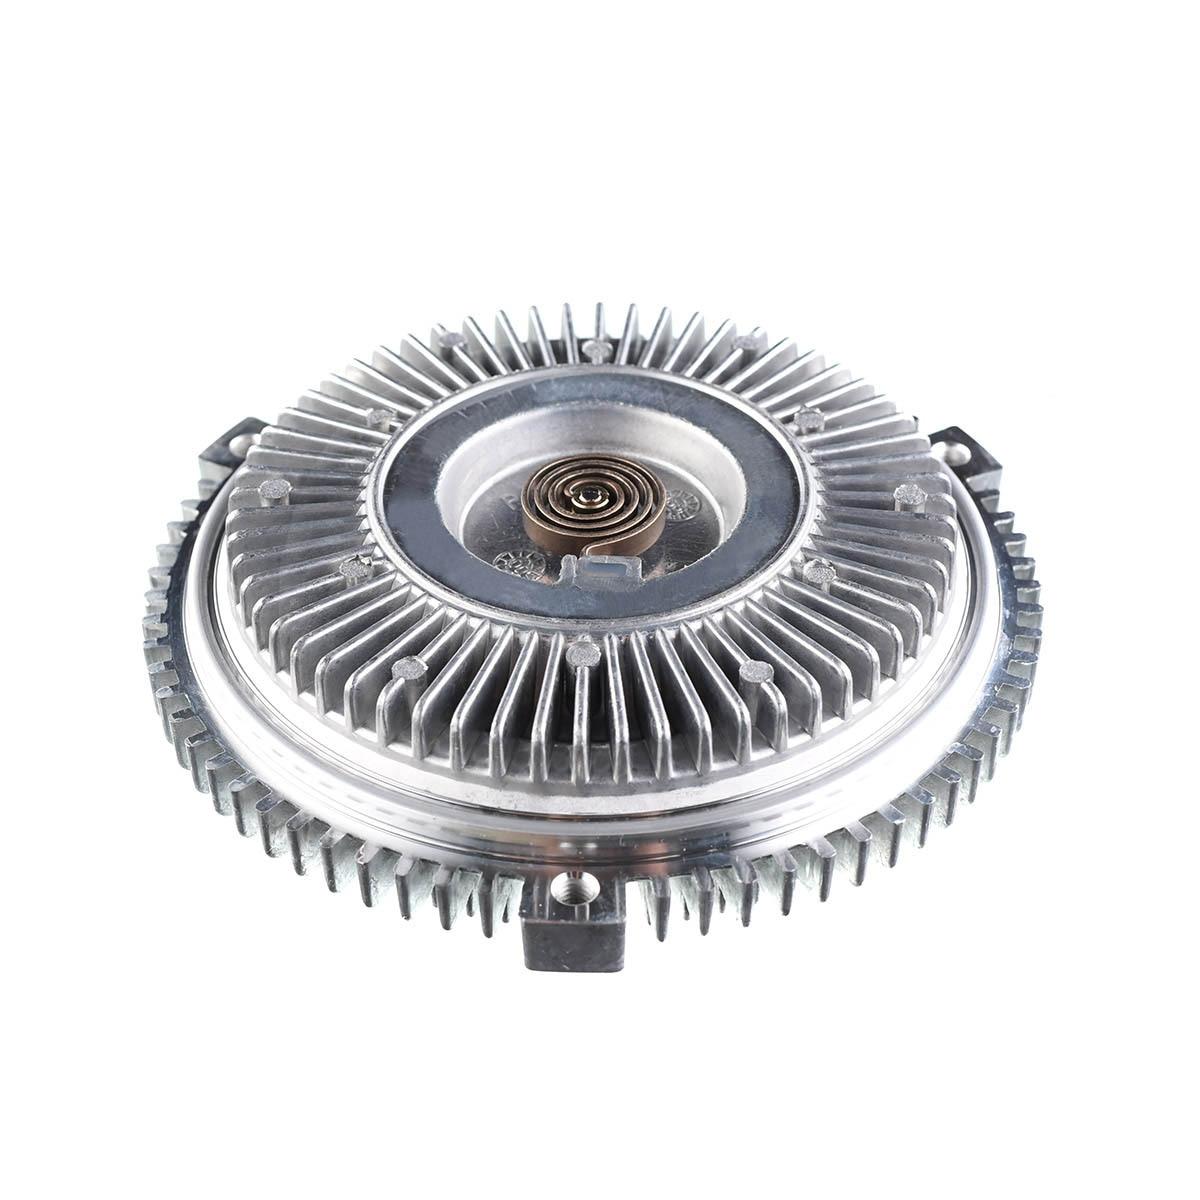 medium resolution of engine cooling fan clutch for bmw e31 e32 e34 e38 e39 530i 540i 740i 750il 840ci 11527502804 11521723829 11521745134 in fans kits from automobiles